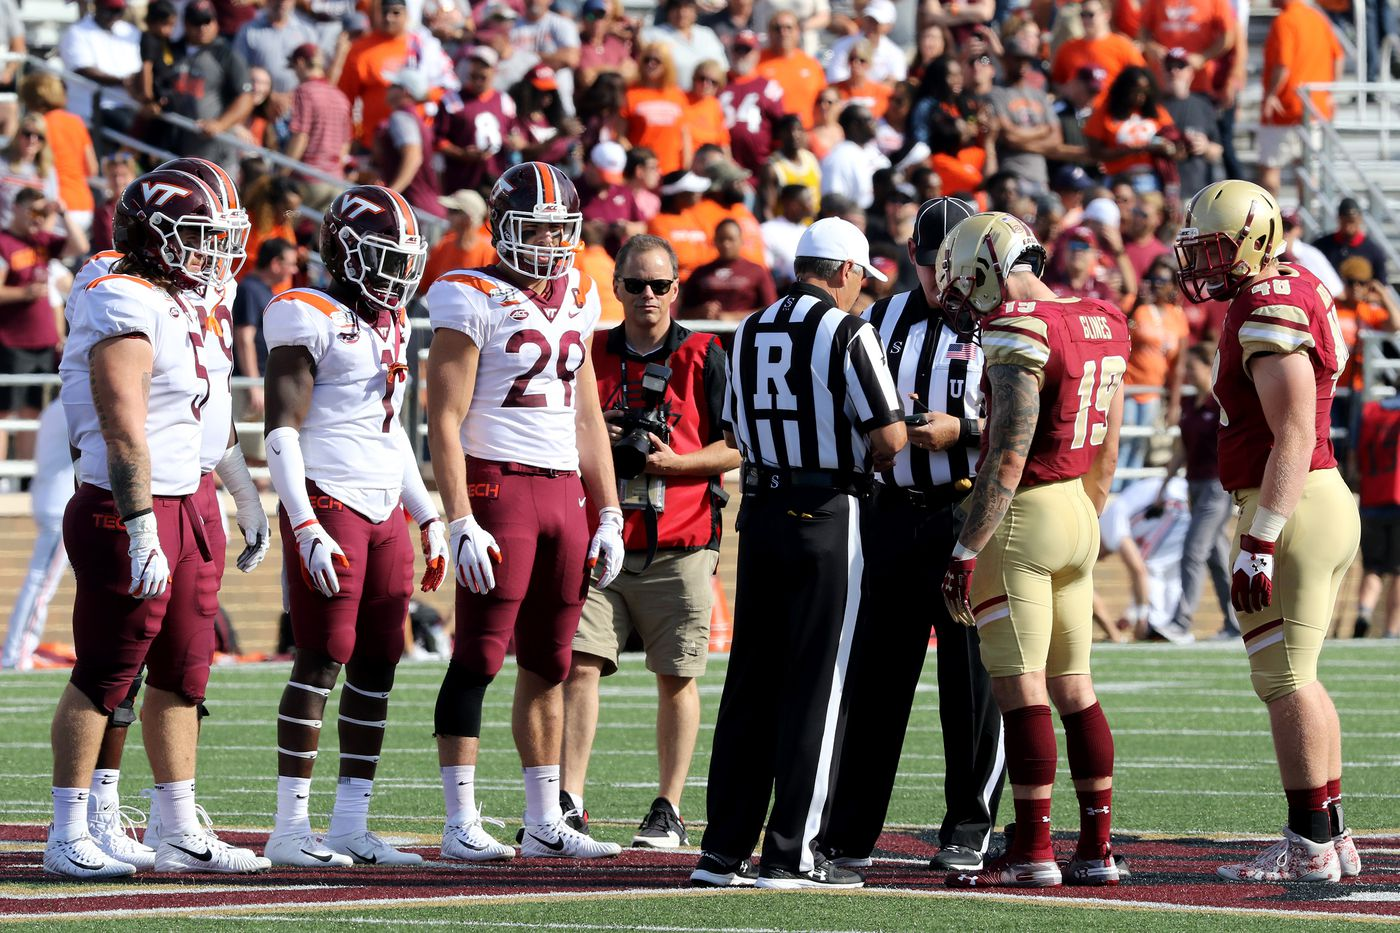 Virginia Tech football: 5 takeaways from Hokies' loss at